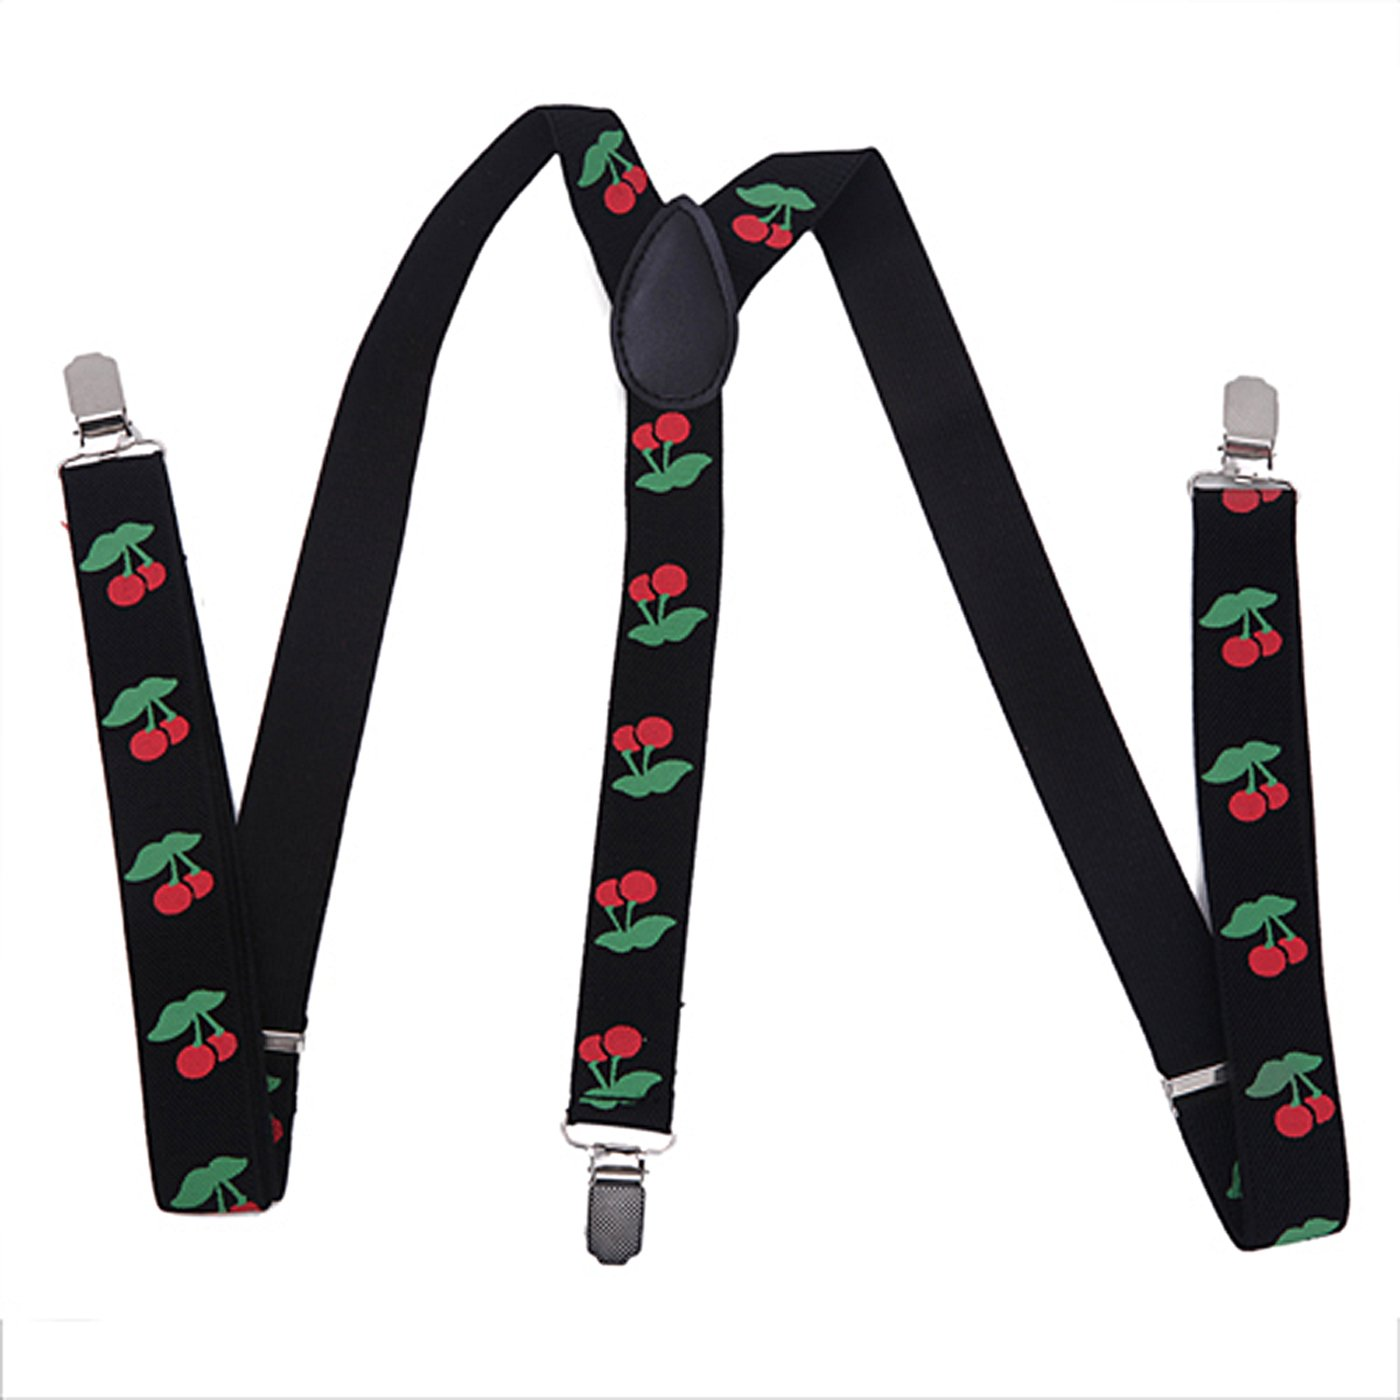 HDE Mens Cherry Suspenders 1 Inch Wide Y-Back Adjustable Elastic Shoulder Strap